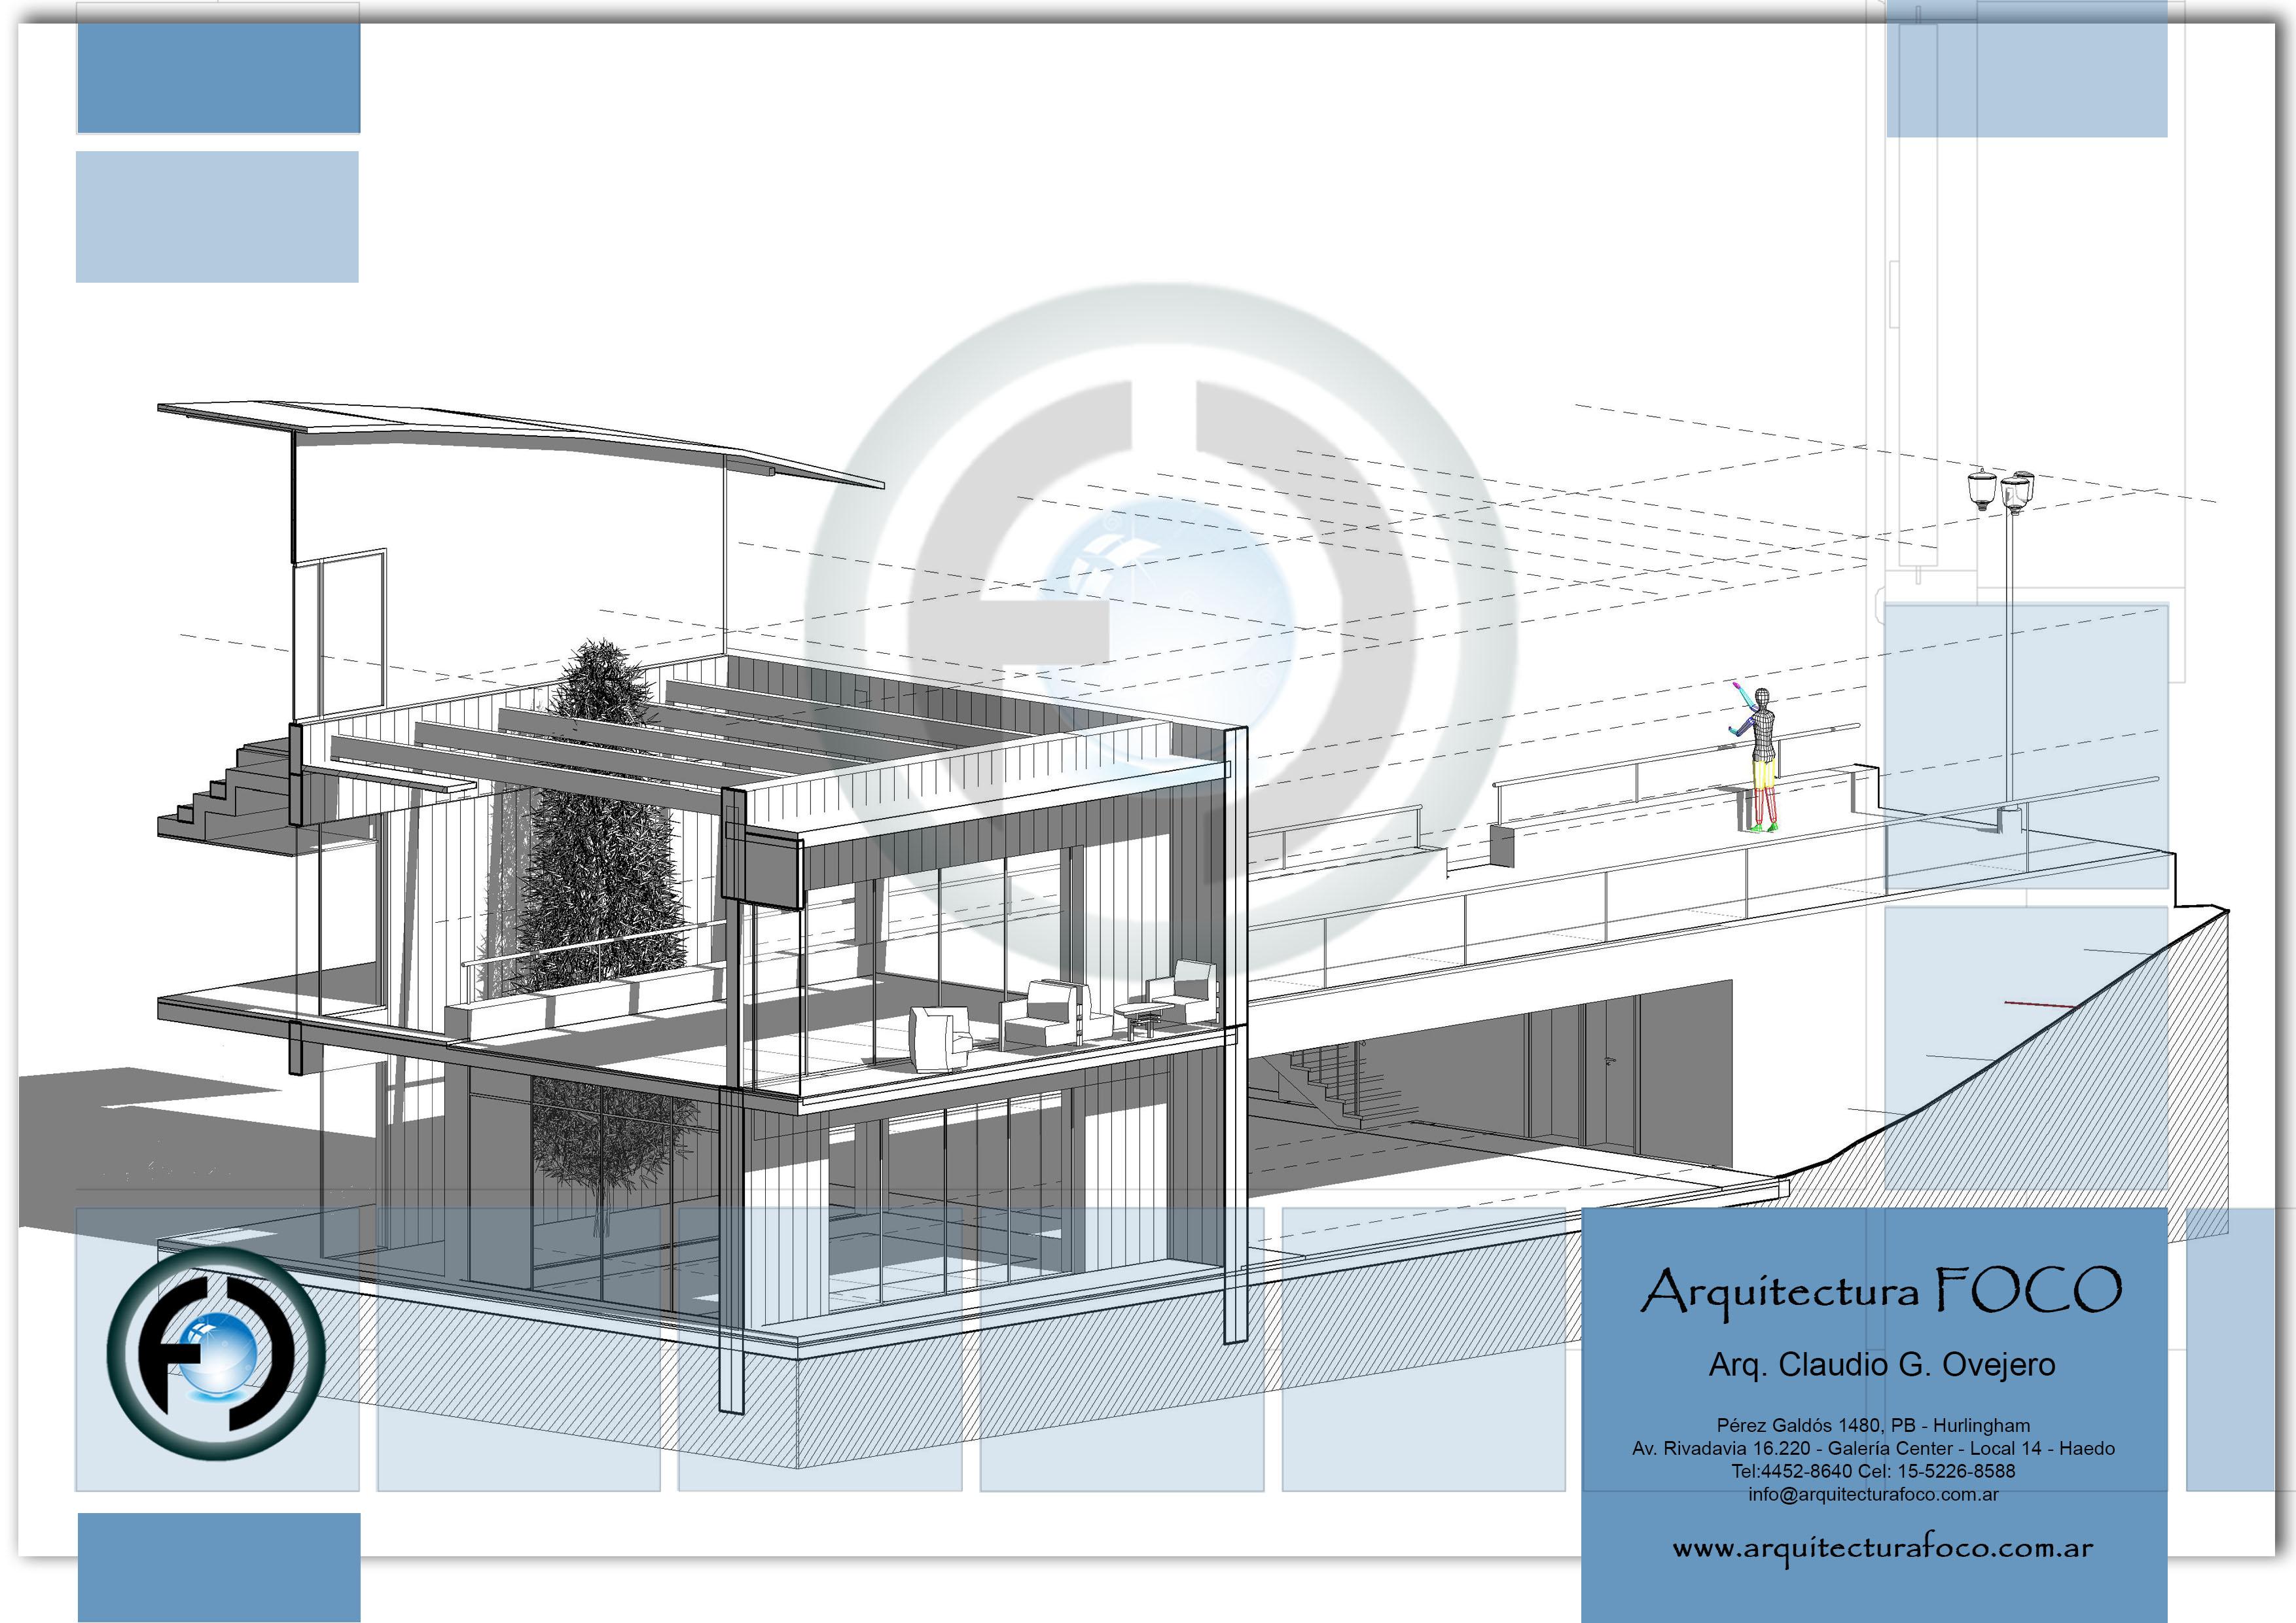 Croquis, anteproyecto, Proyecto en zona oeste. Buenos Aires.